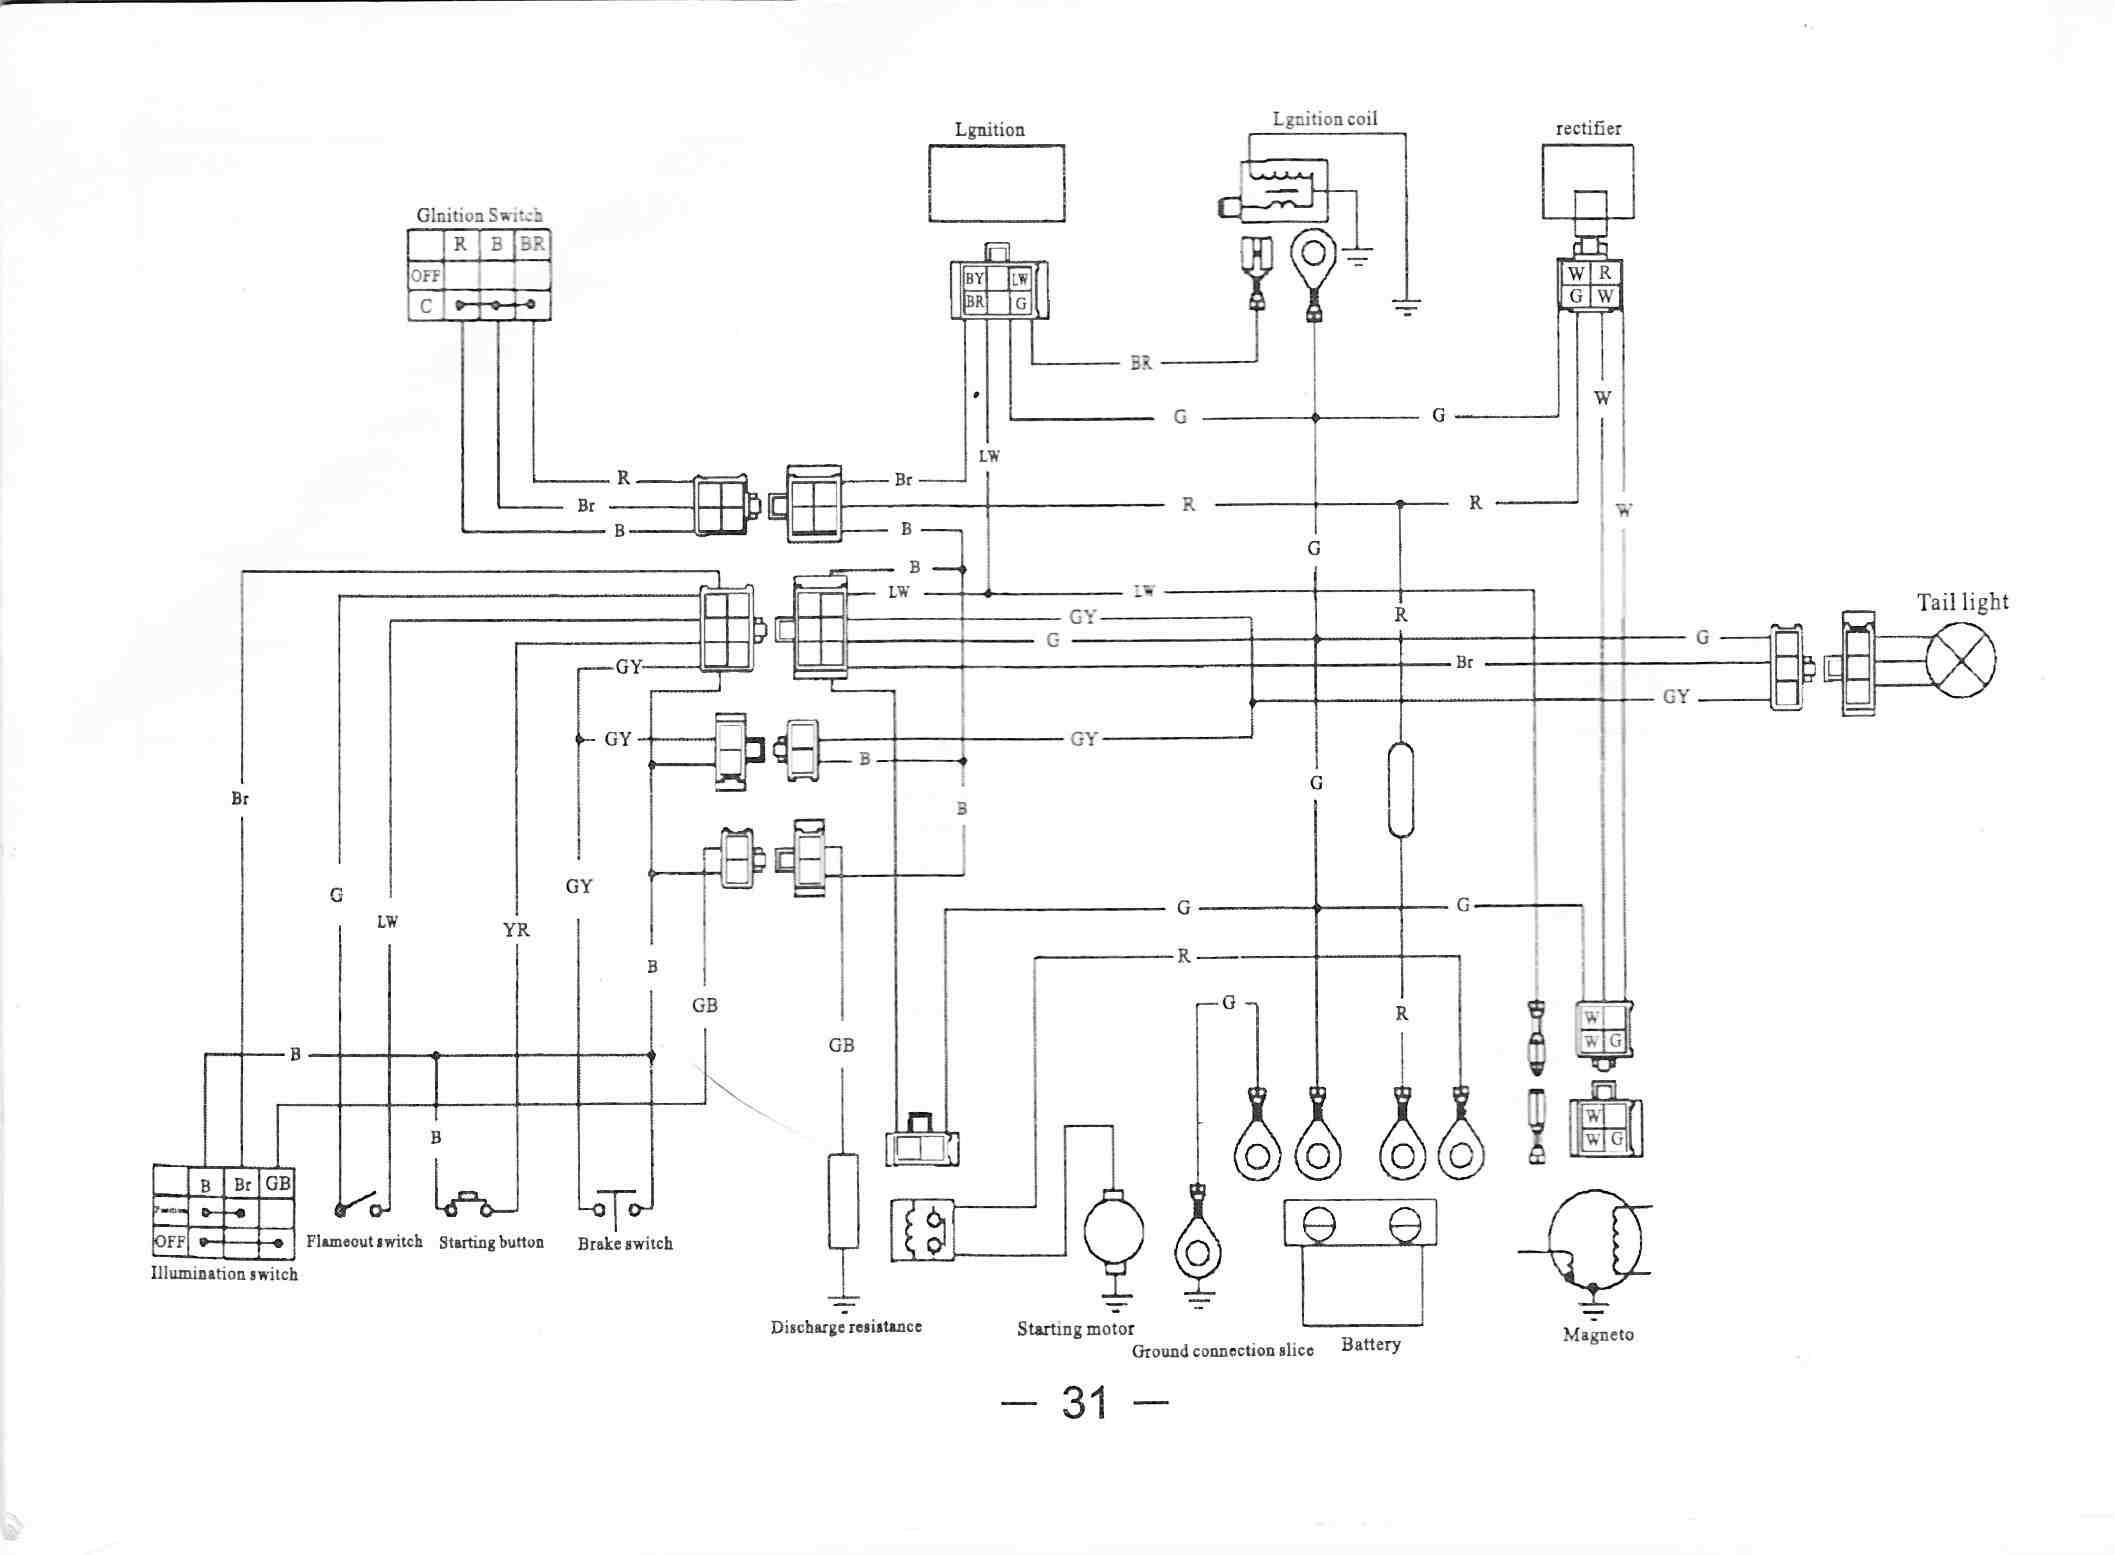 yamaha aerox 100 wiring diagram efcaviation com yamaha aerox electrical diagram 2004 yamaha aerox wiring diagram